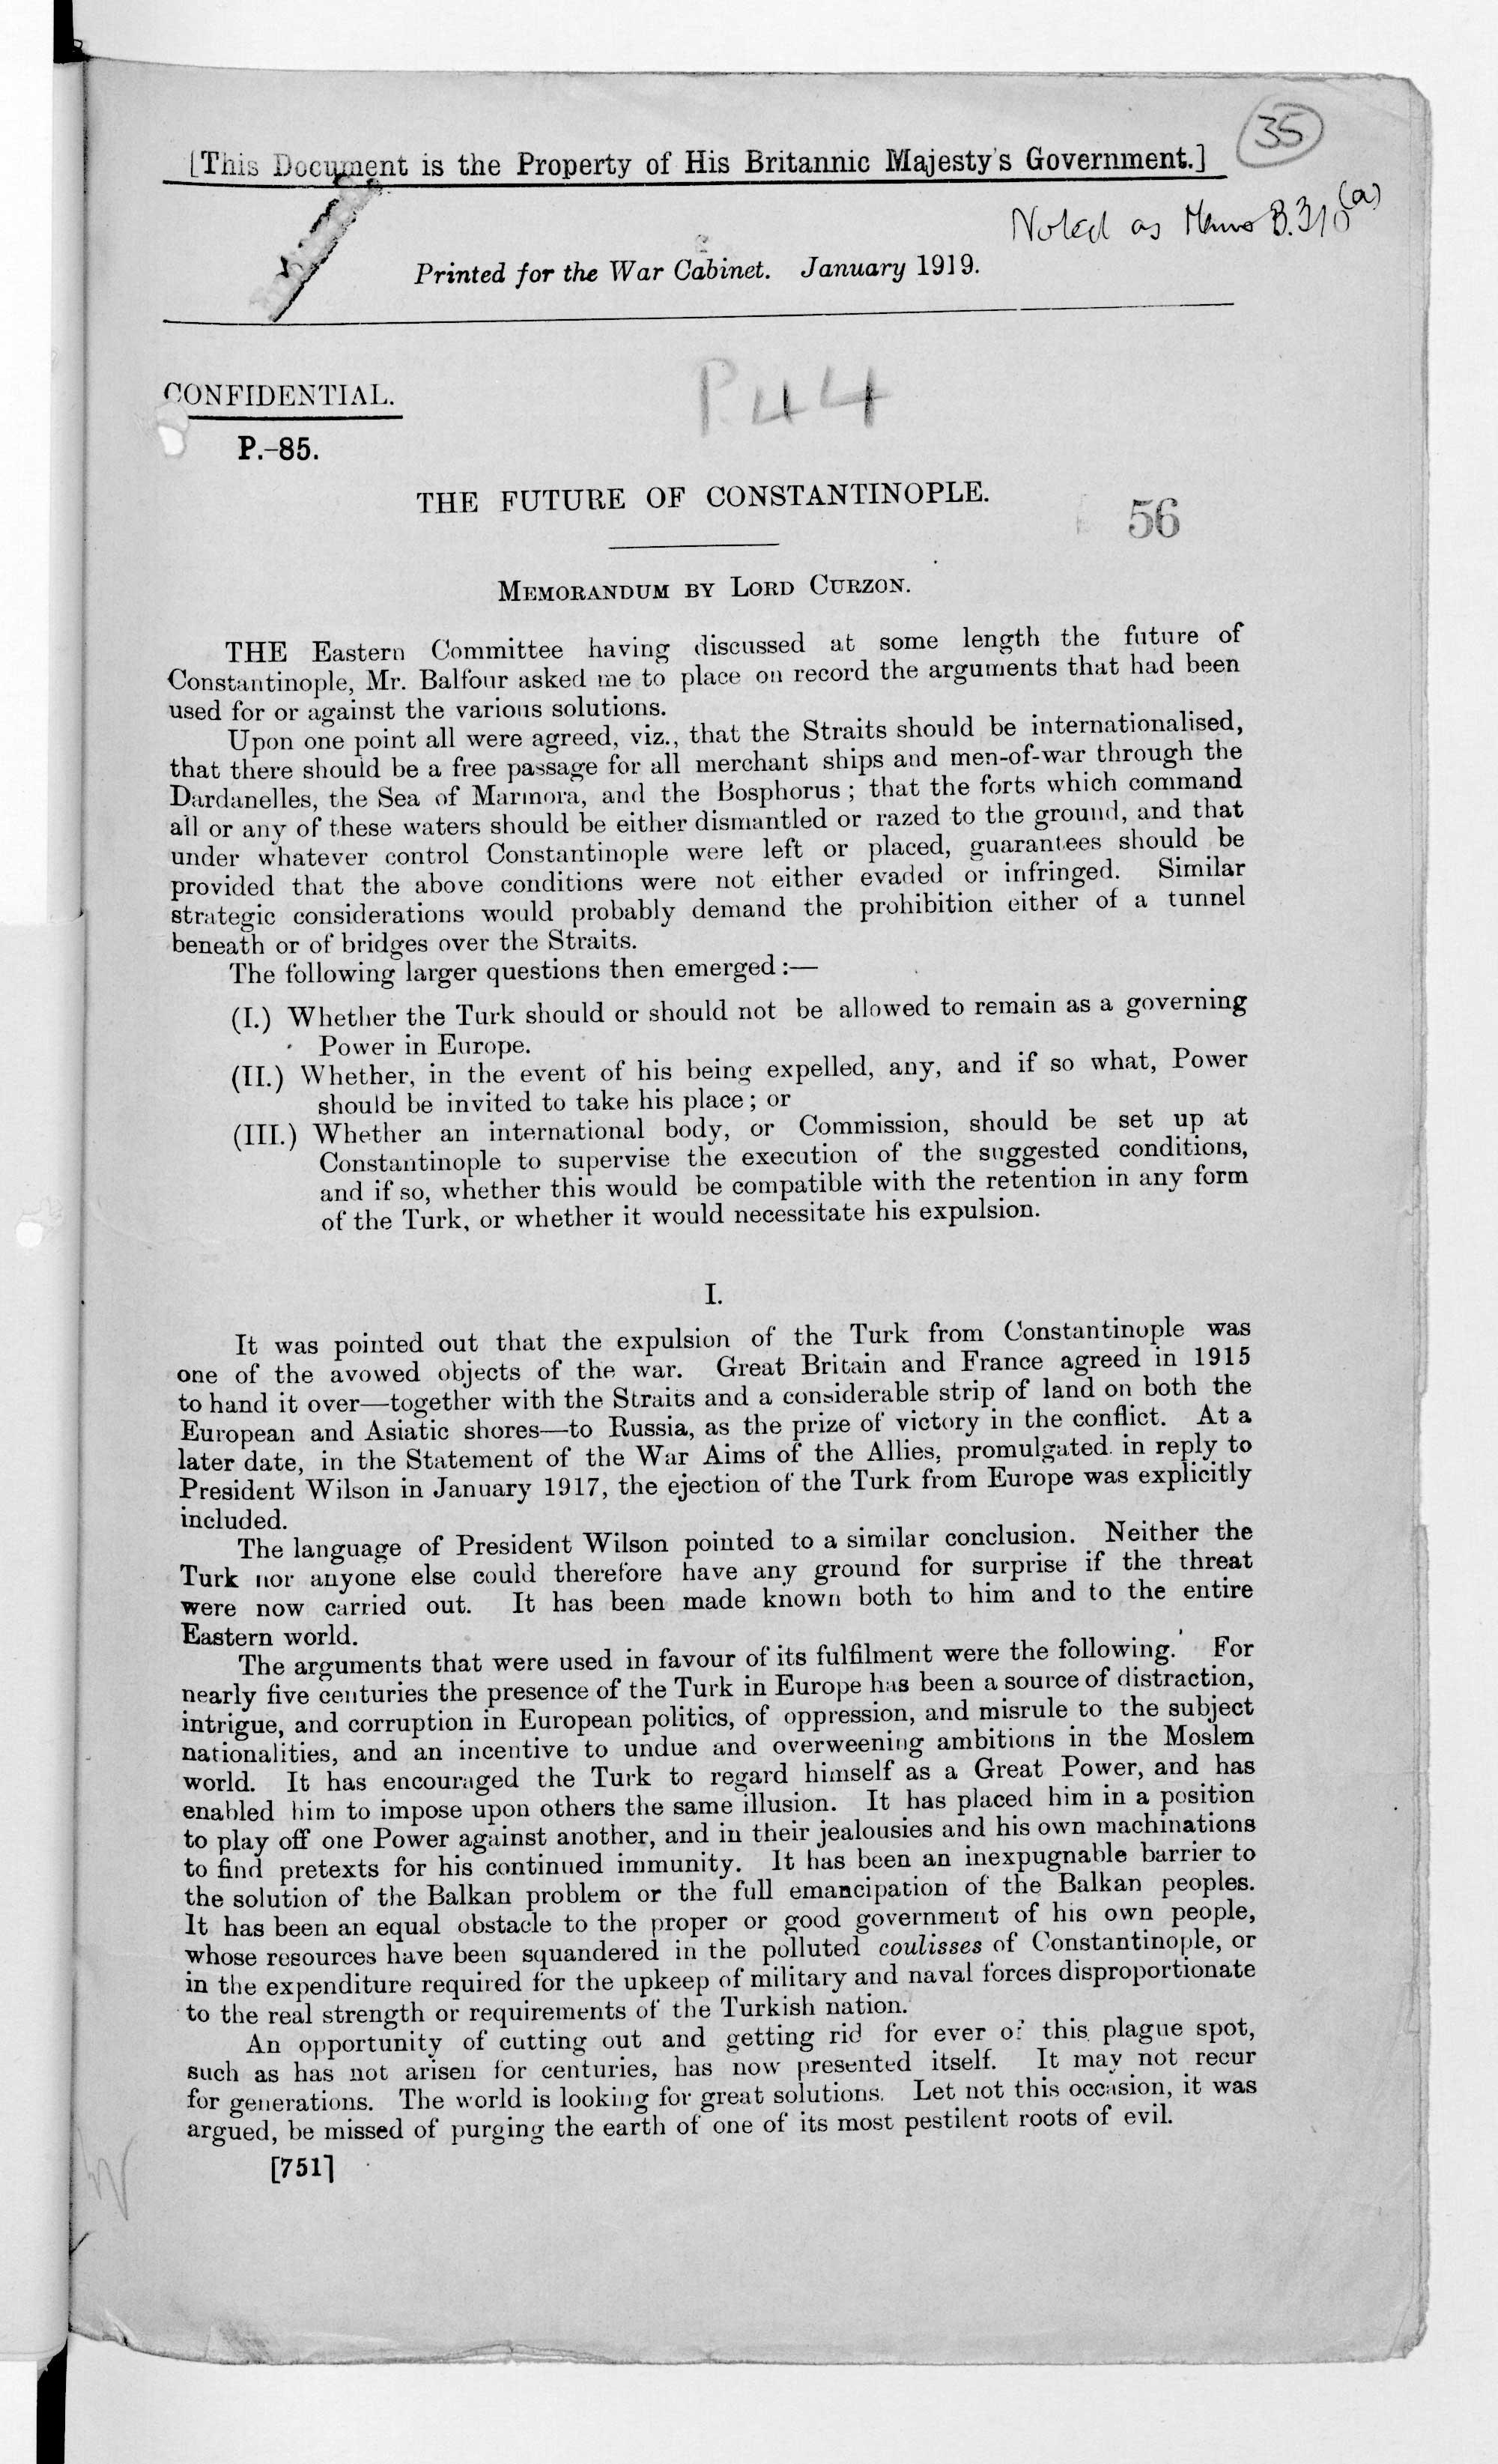 Memorandum by Lord Curzon, summarising the debates regarding the future of Constantinople (modern-day Istanbul). 2 January 1918.